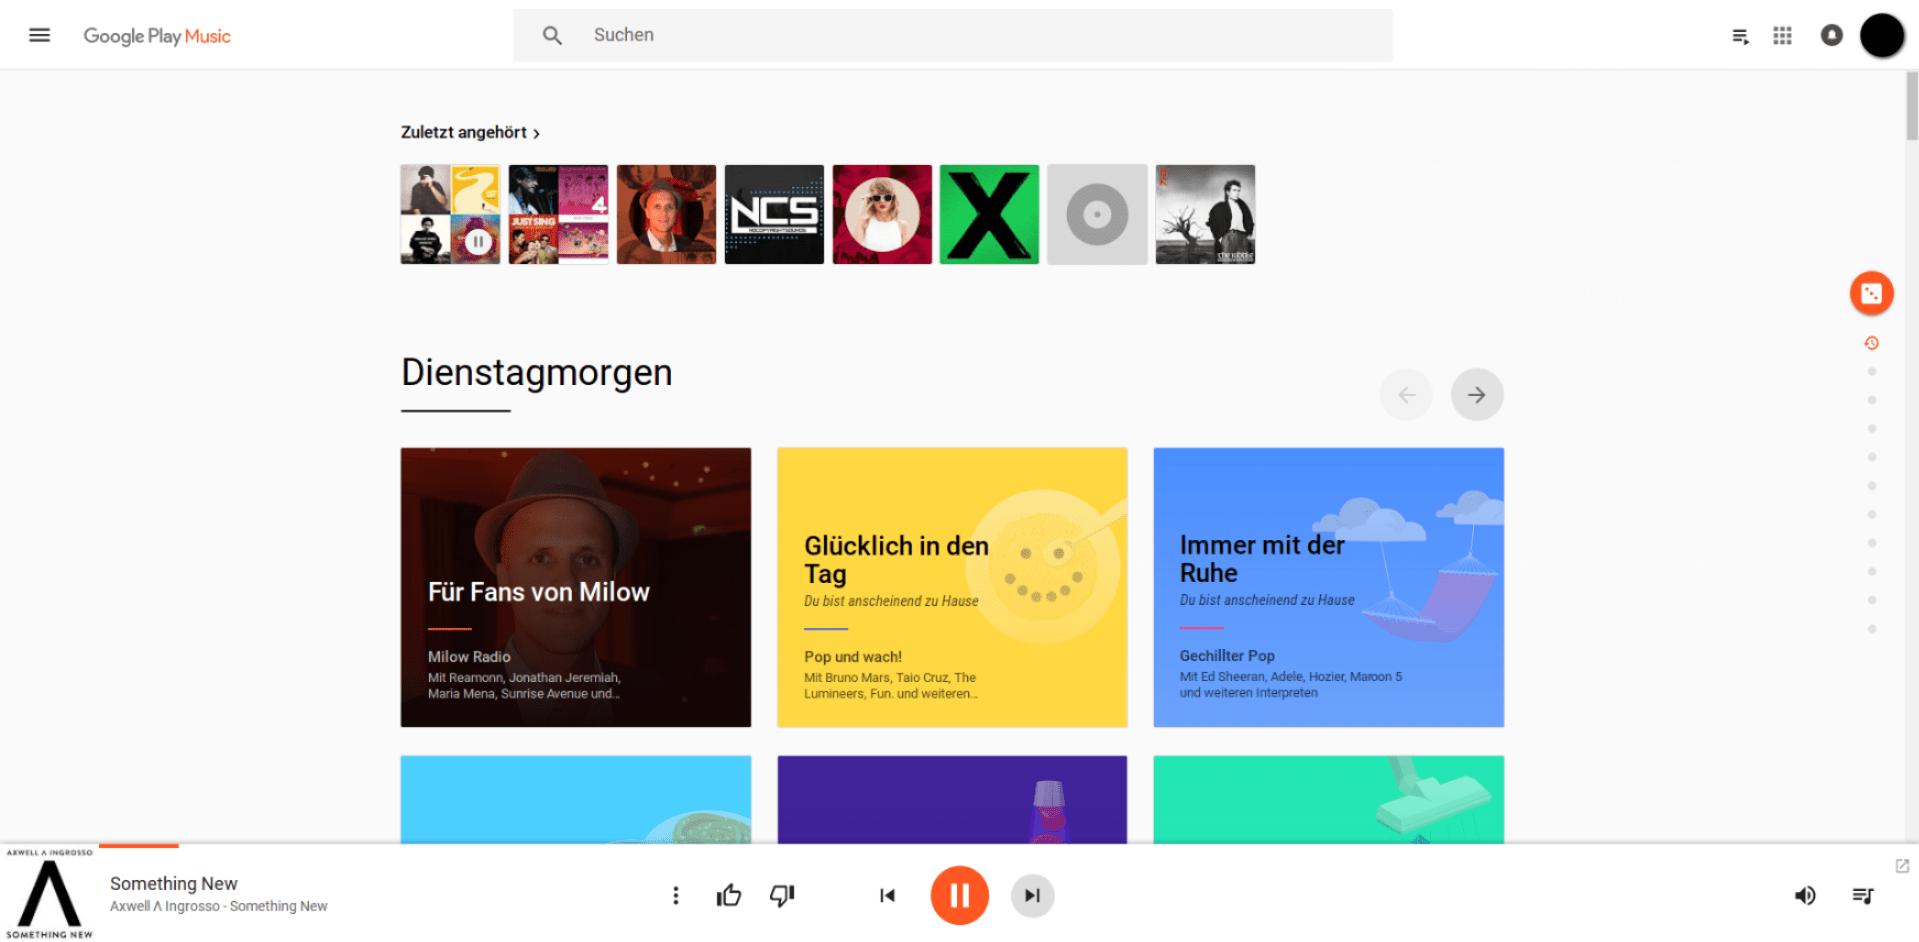 Google Play Musik im Browser - Apps: Siehe oben.